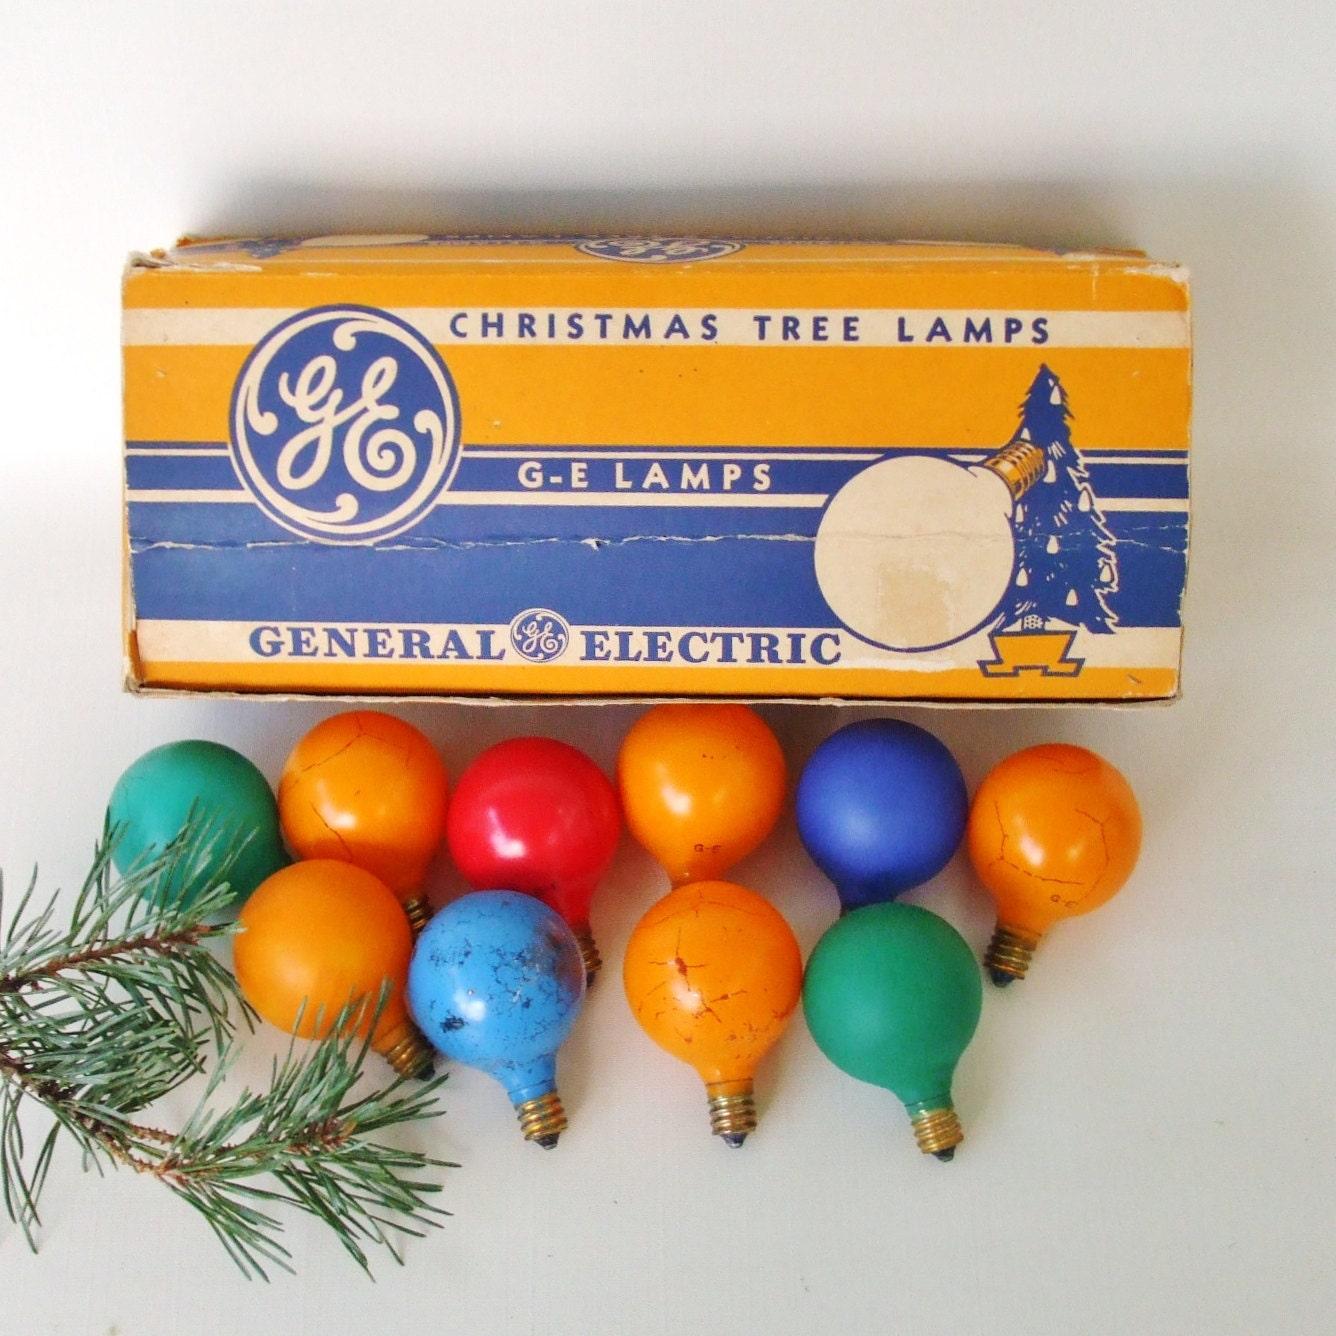 GE Christmas Light Bulbs Vintage General Electric G-14